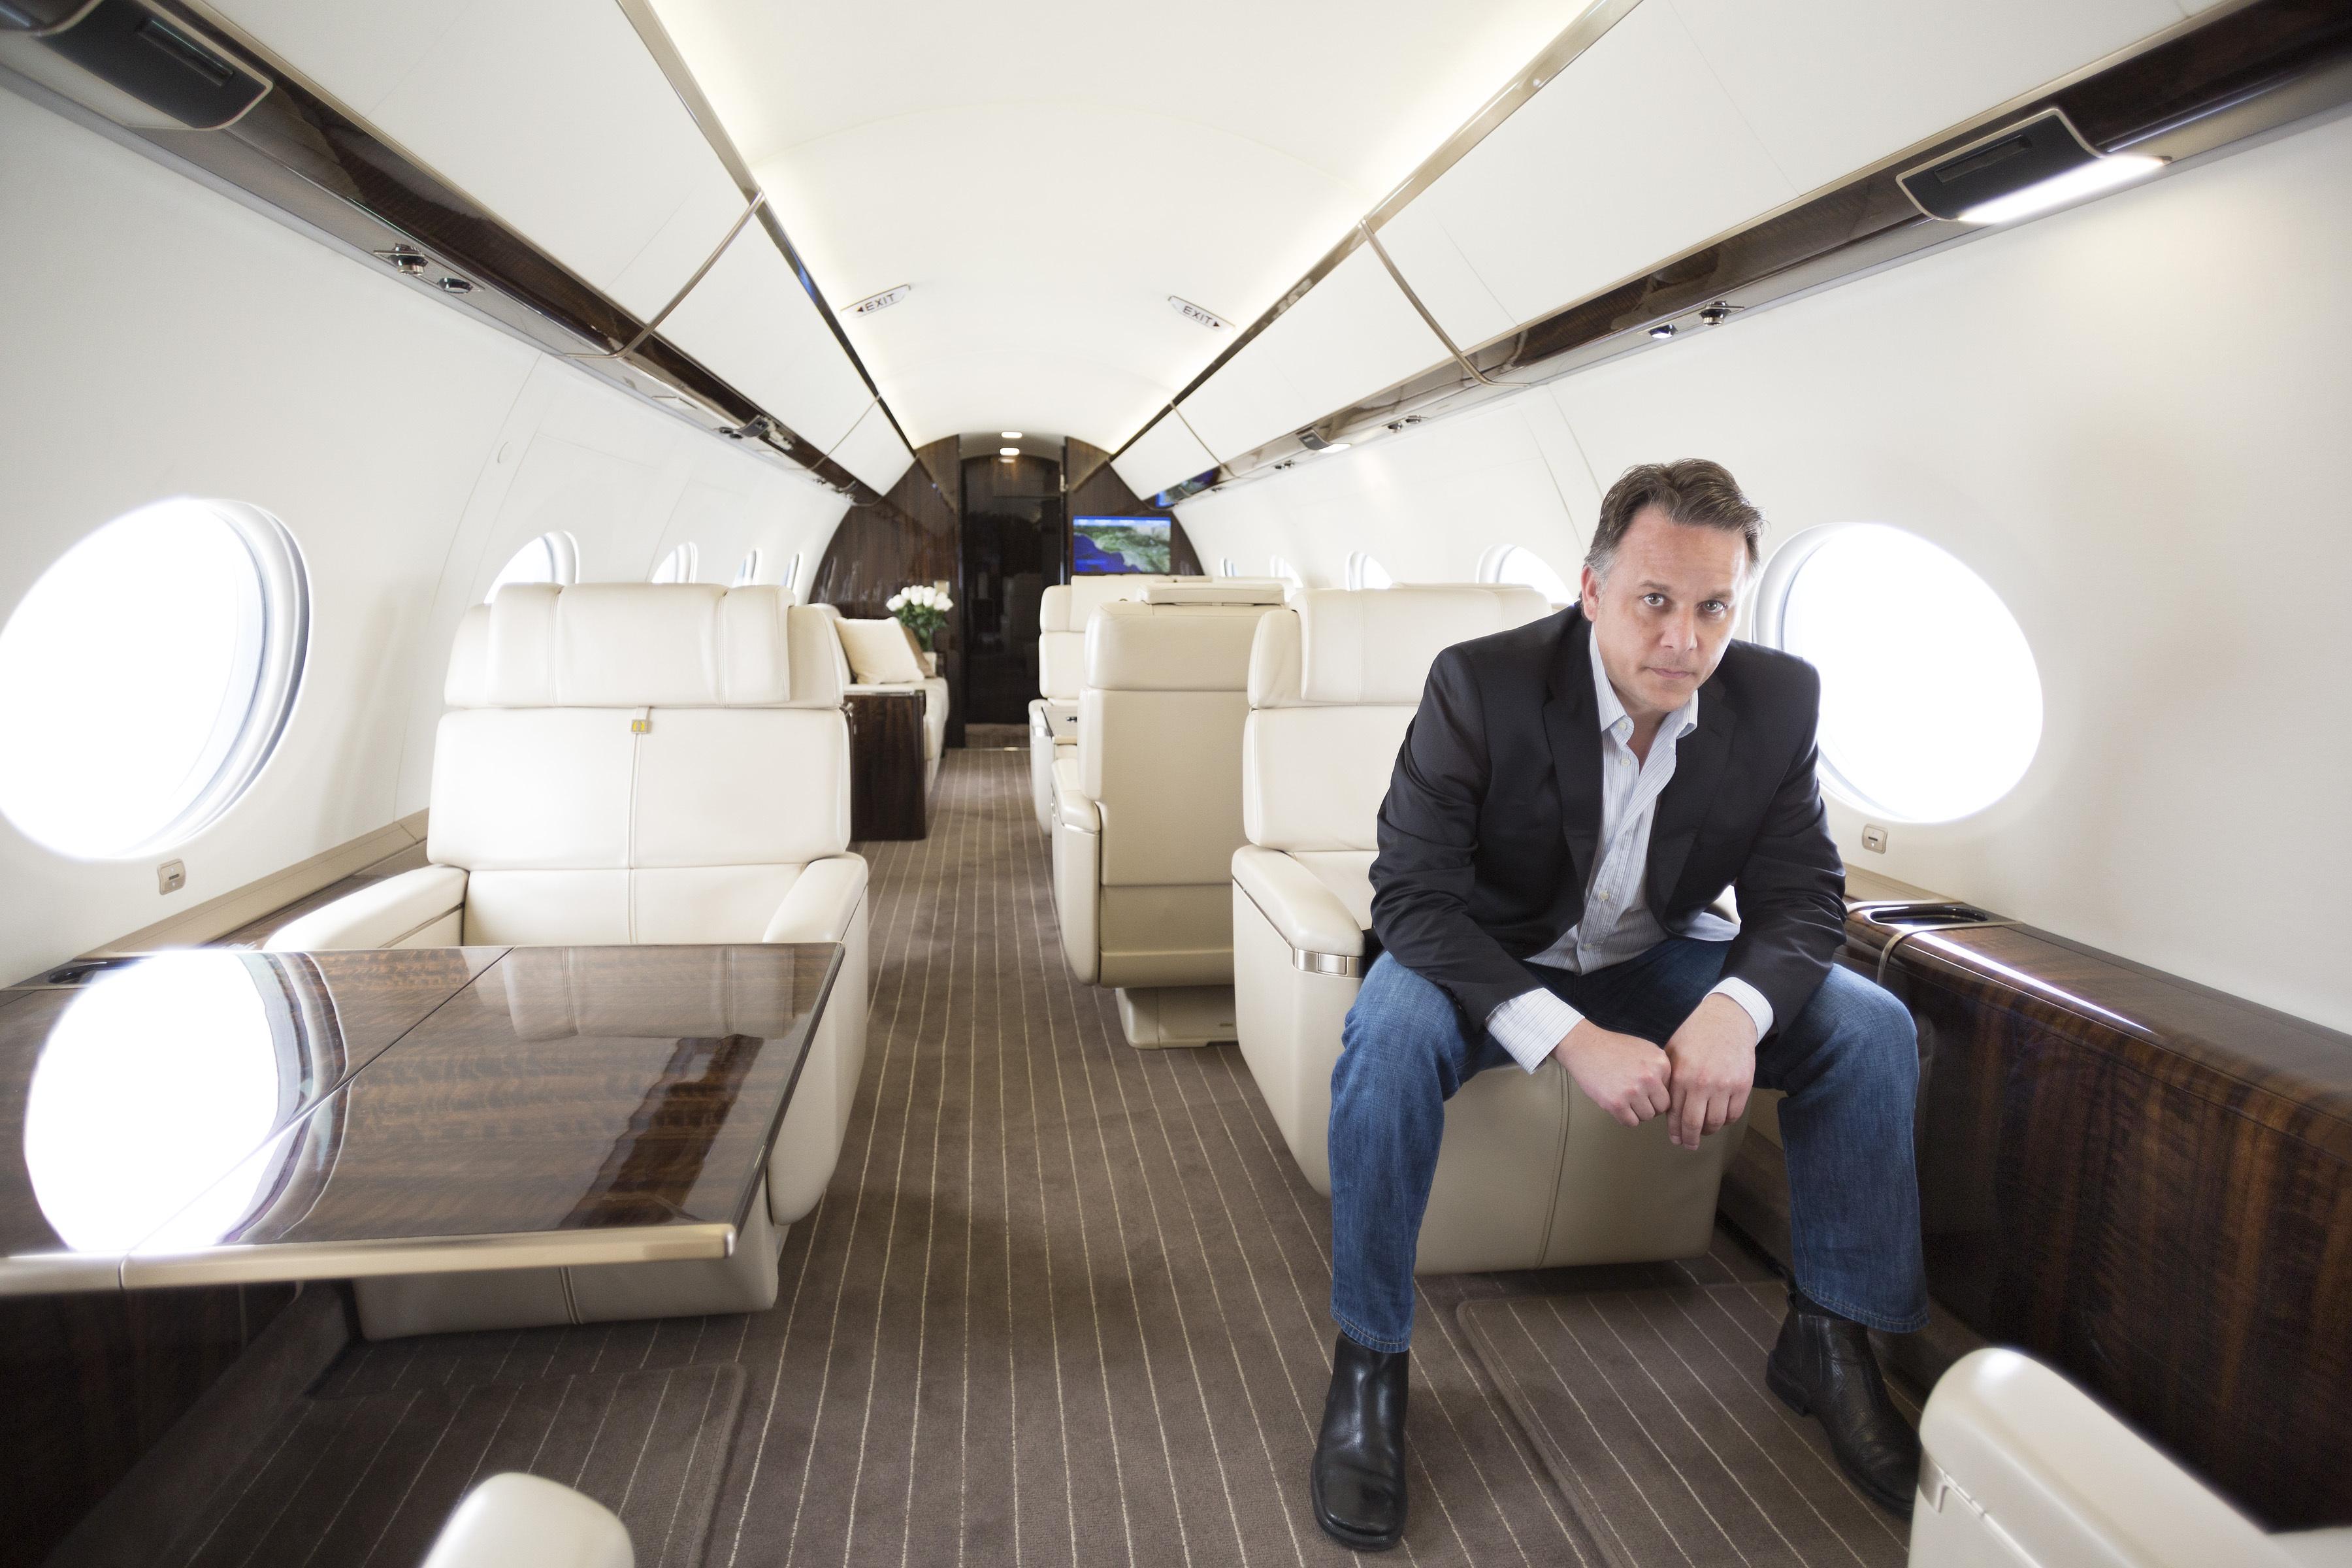 Jet Edge completes sale of a Gulfstream G650 adding Longest Range